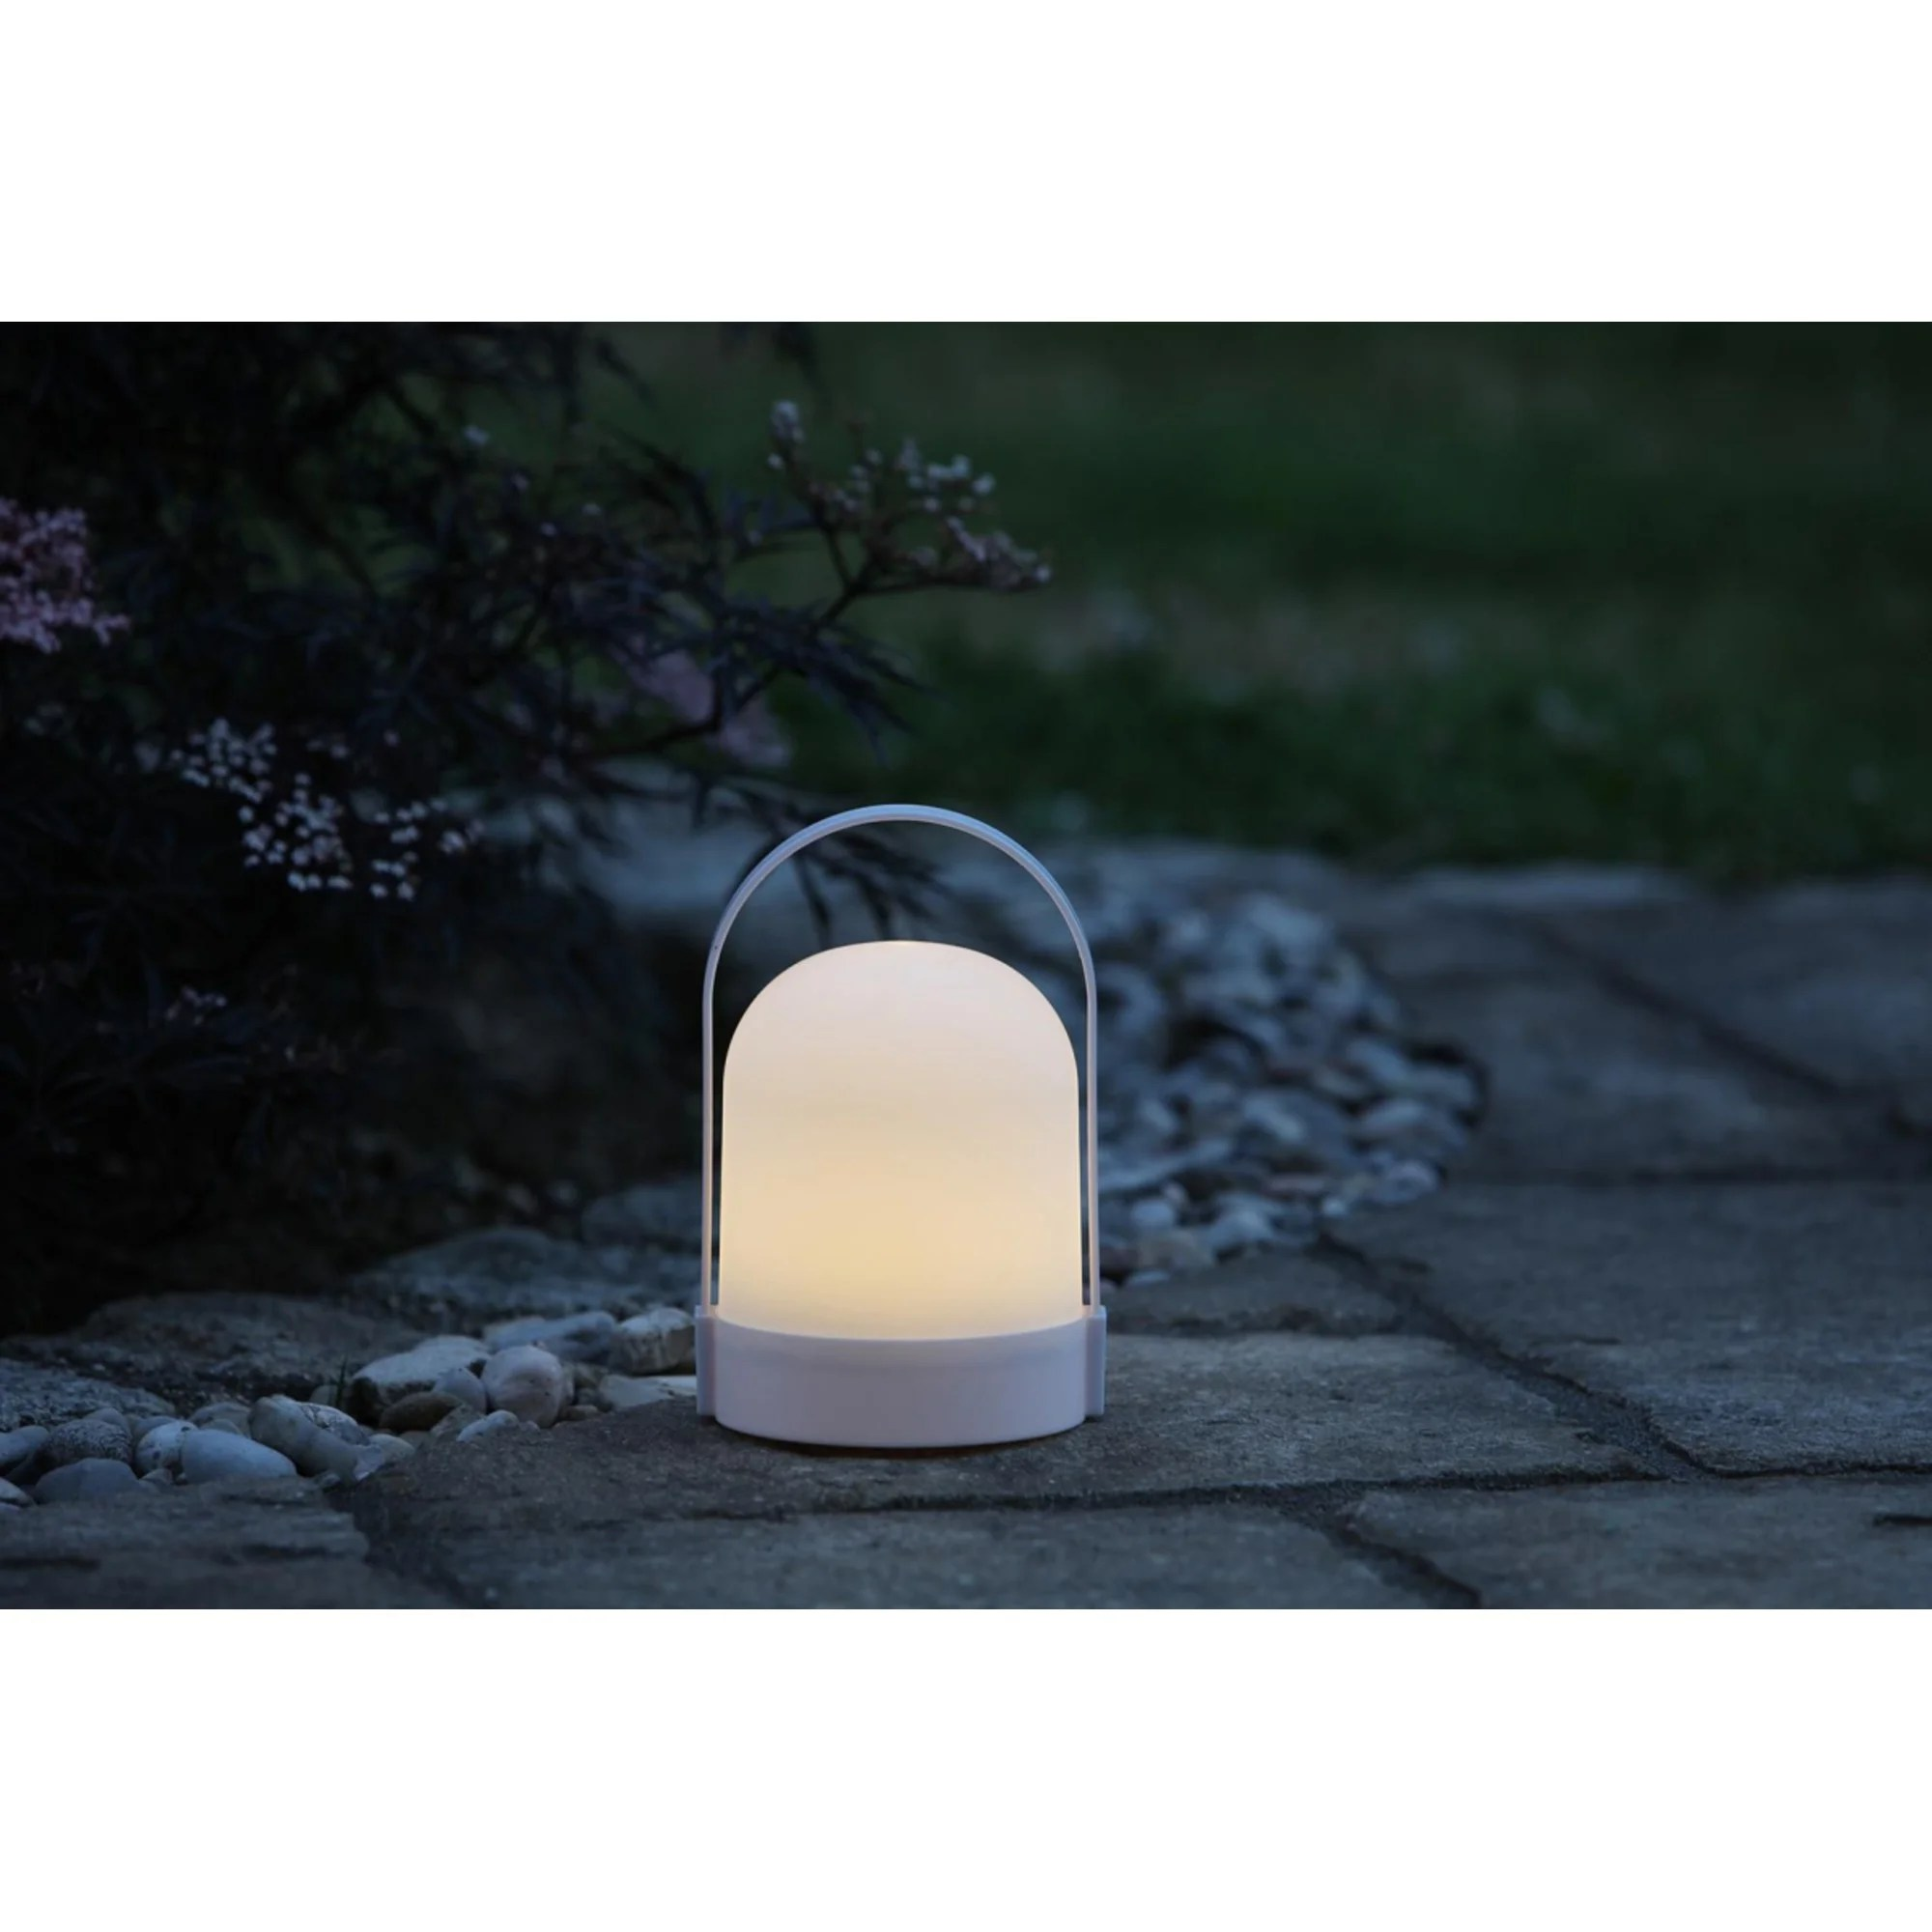 Corrigan Studio Gathers 21cm Battery Powered Led Outdoor Table Lamp Wayfair Co Uk